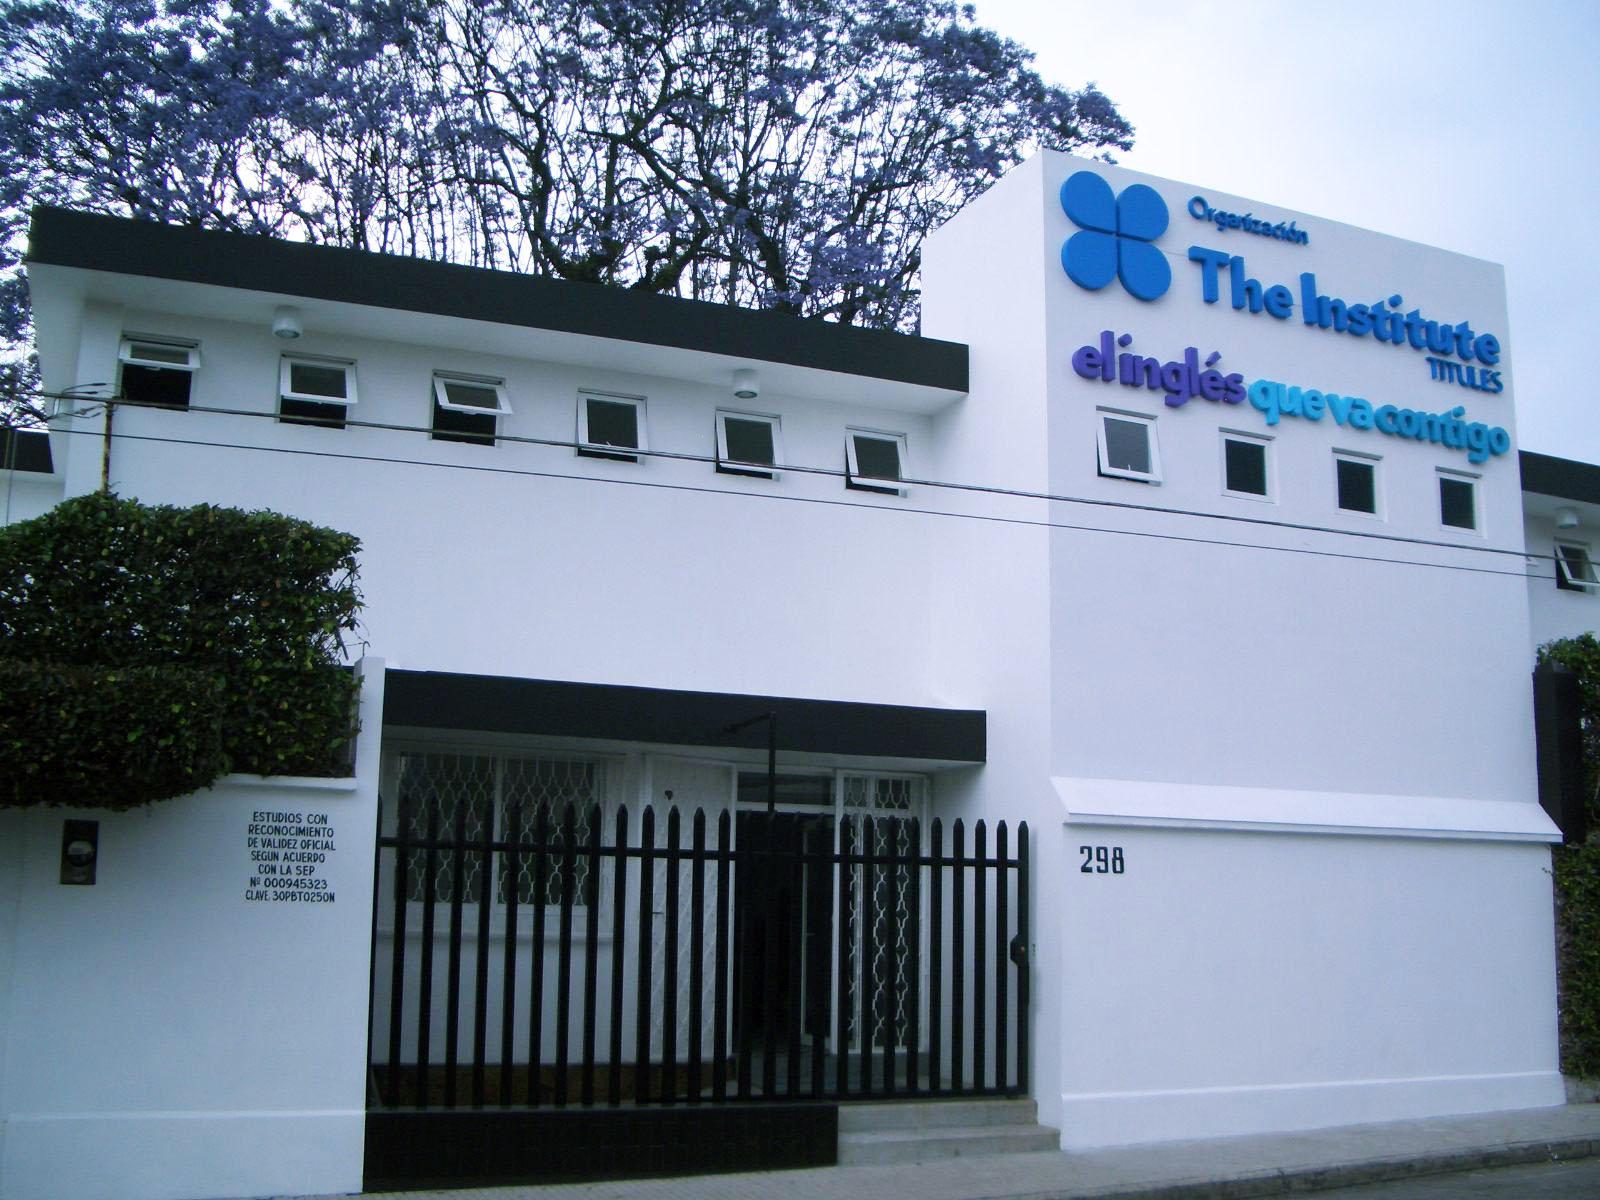 The Institute Orizaba 2015